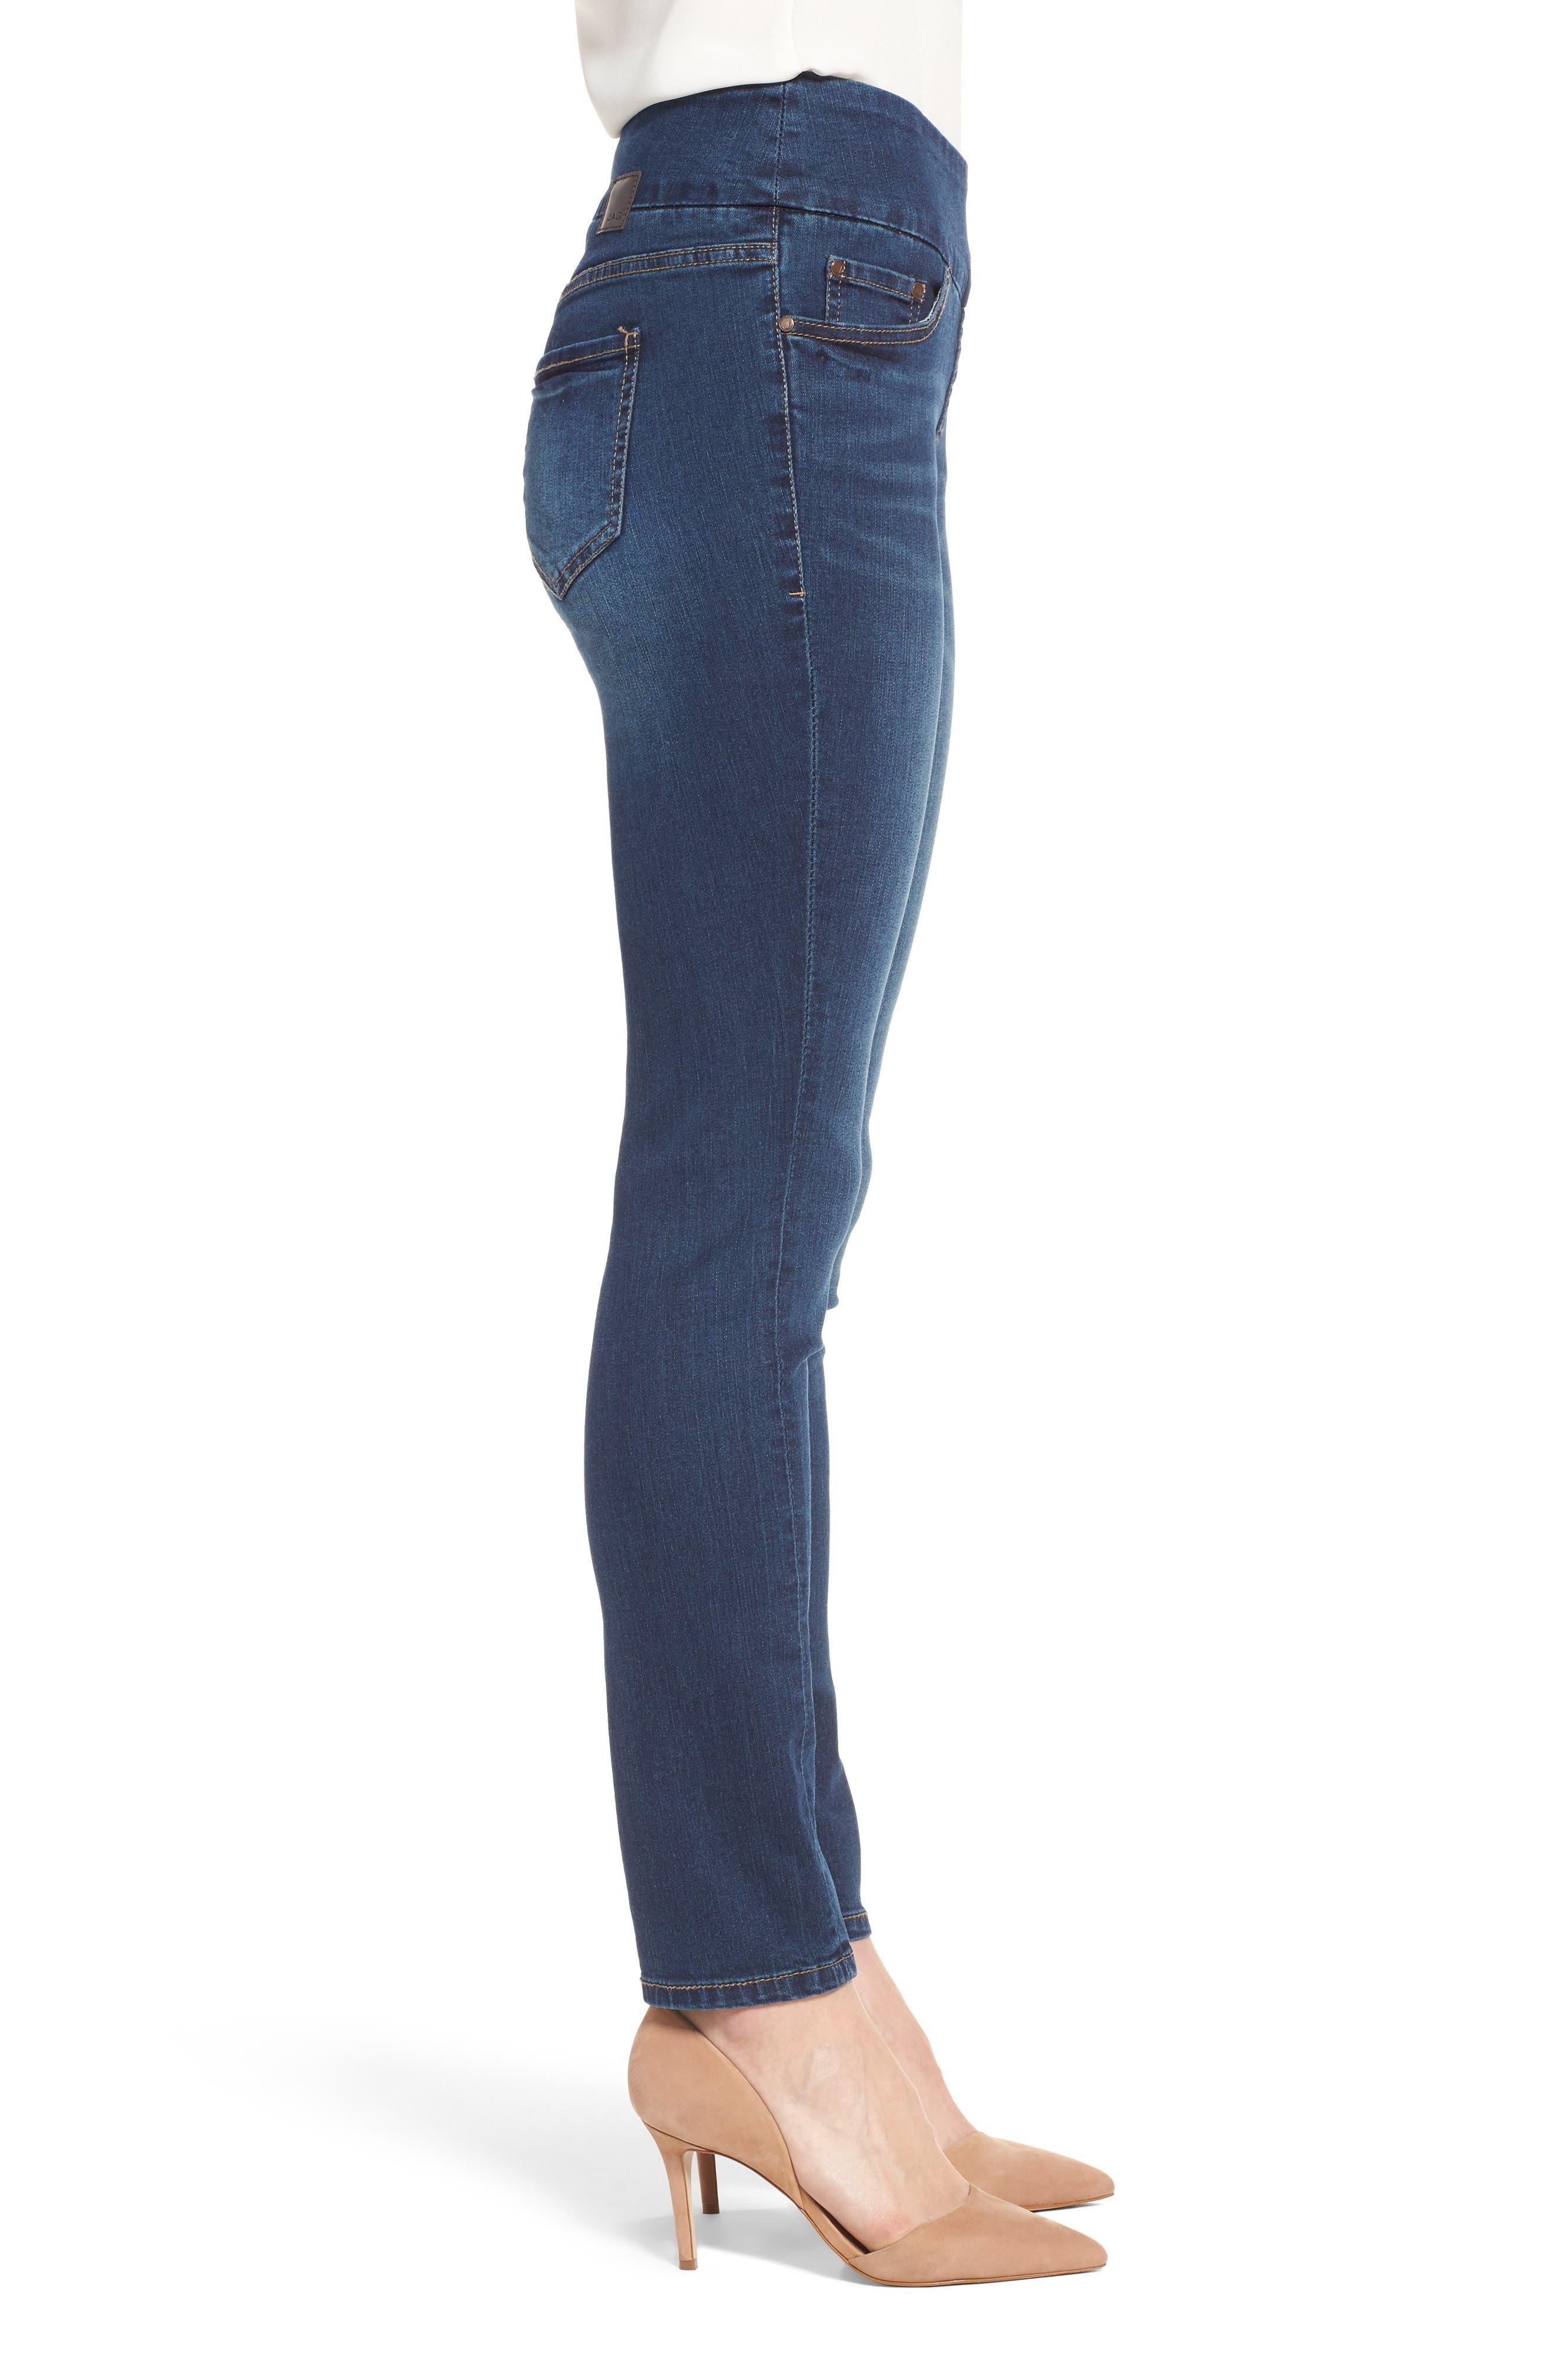 Alternate Image 3  - Jag Jeans Nora Stretch Skinny Jeans (Regular & Petite)